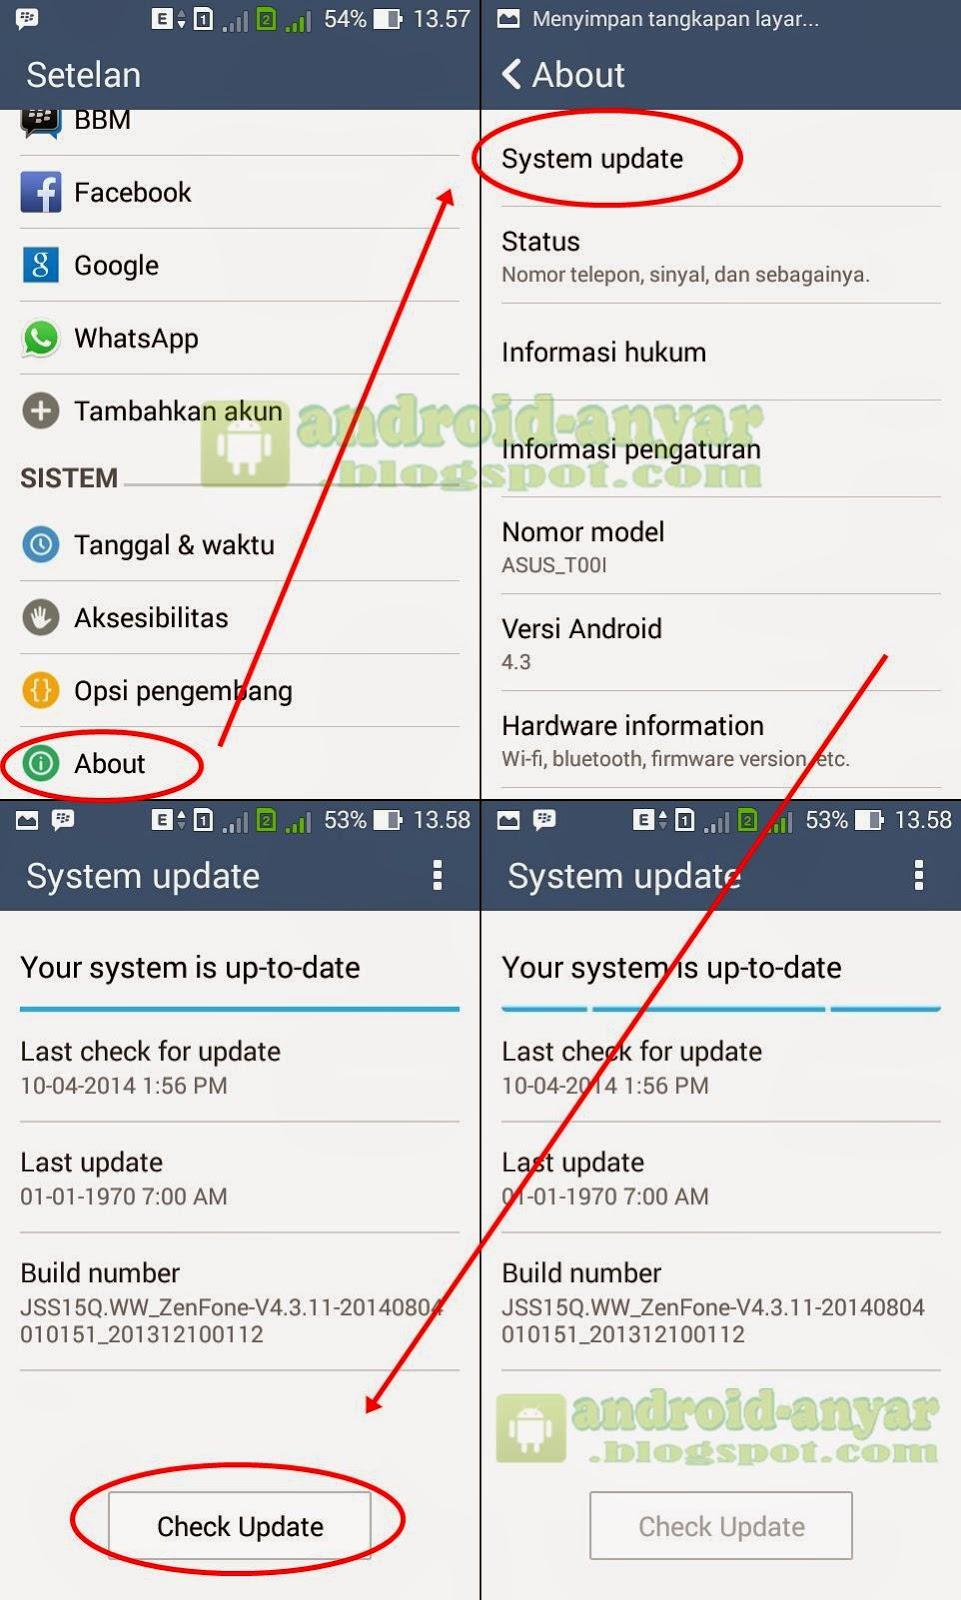 Cara Upgrade Android Jelly Bean ke KitKat 4.4.2 Asus Zenfone 4